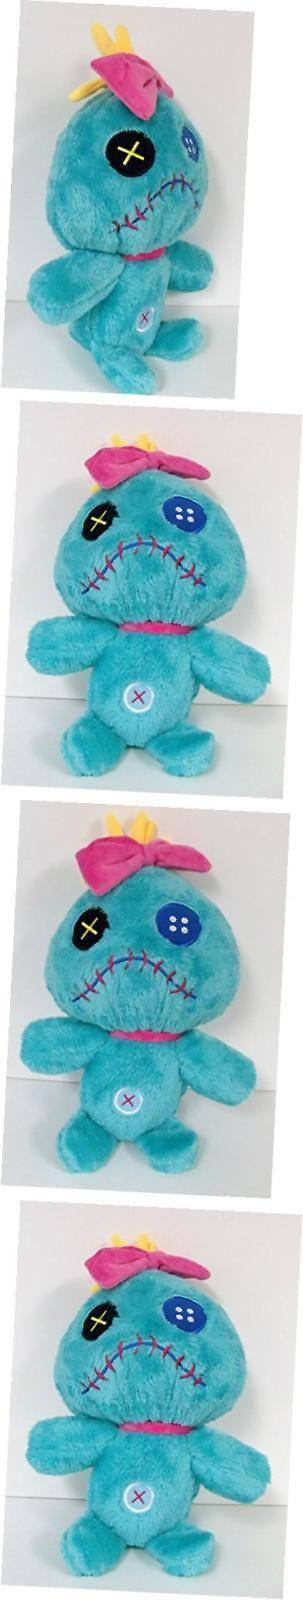 Lilo and Stitch 44035: Lilo And Stitch 13 Plush Scrump Doll -> BUY IT NOW ONLY: $34.74 on eBay!